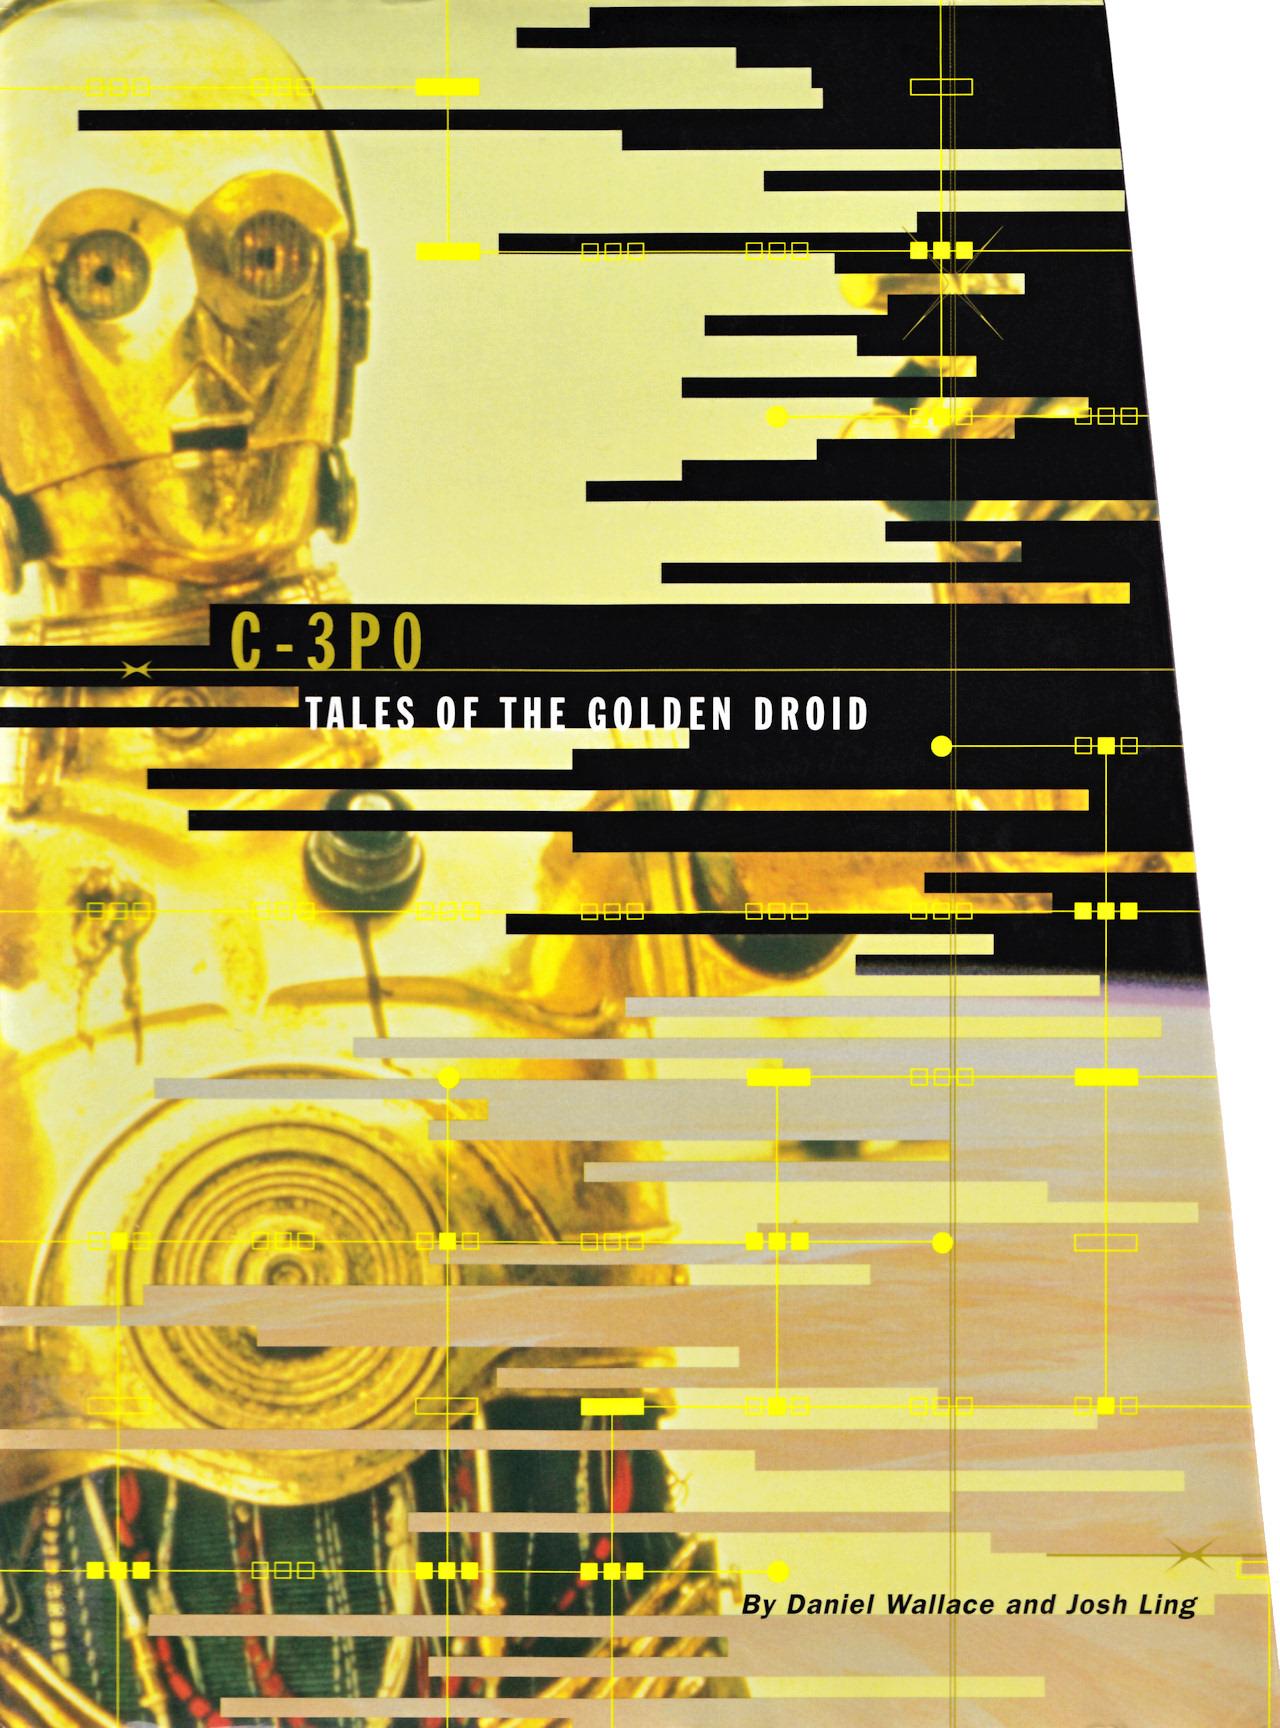 C-3PO: История золотого дроида